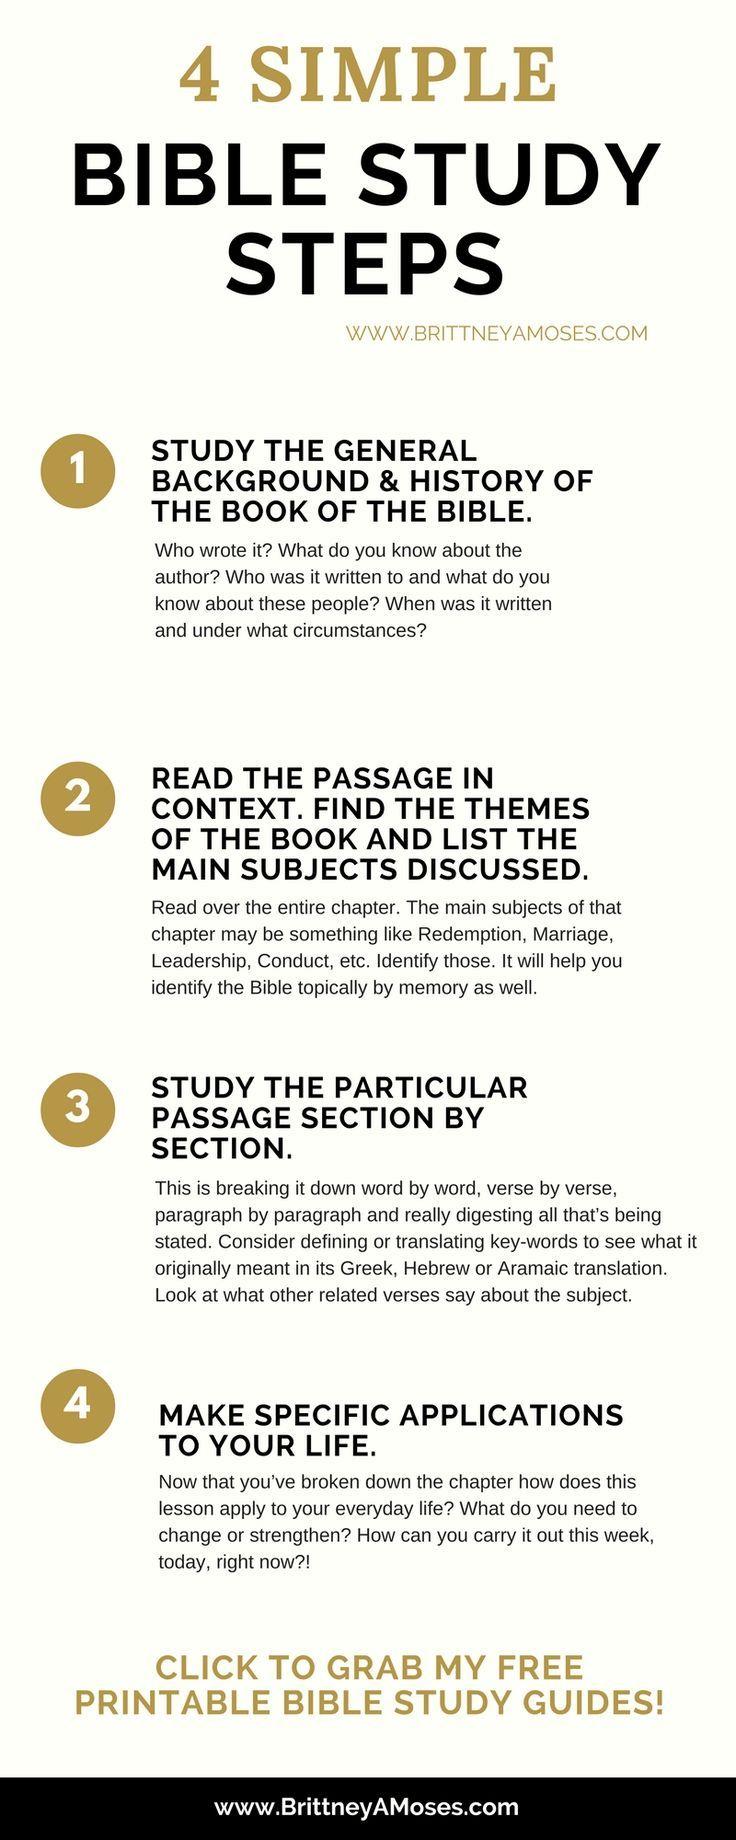 4 Simple Bible Study Steps | God's Word | Pinterest | Bible Study - Free Printable Bible Study Guides